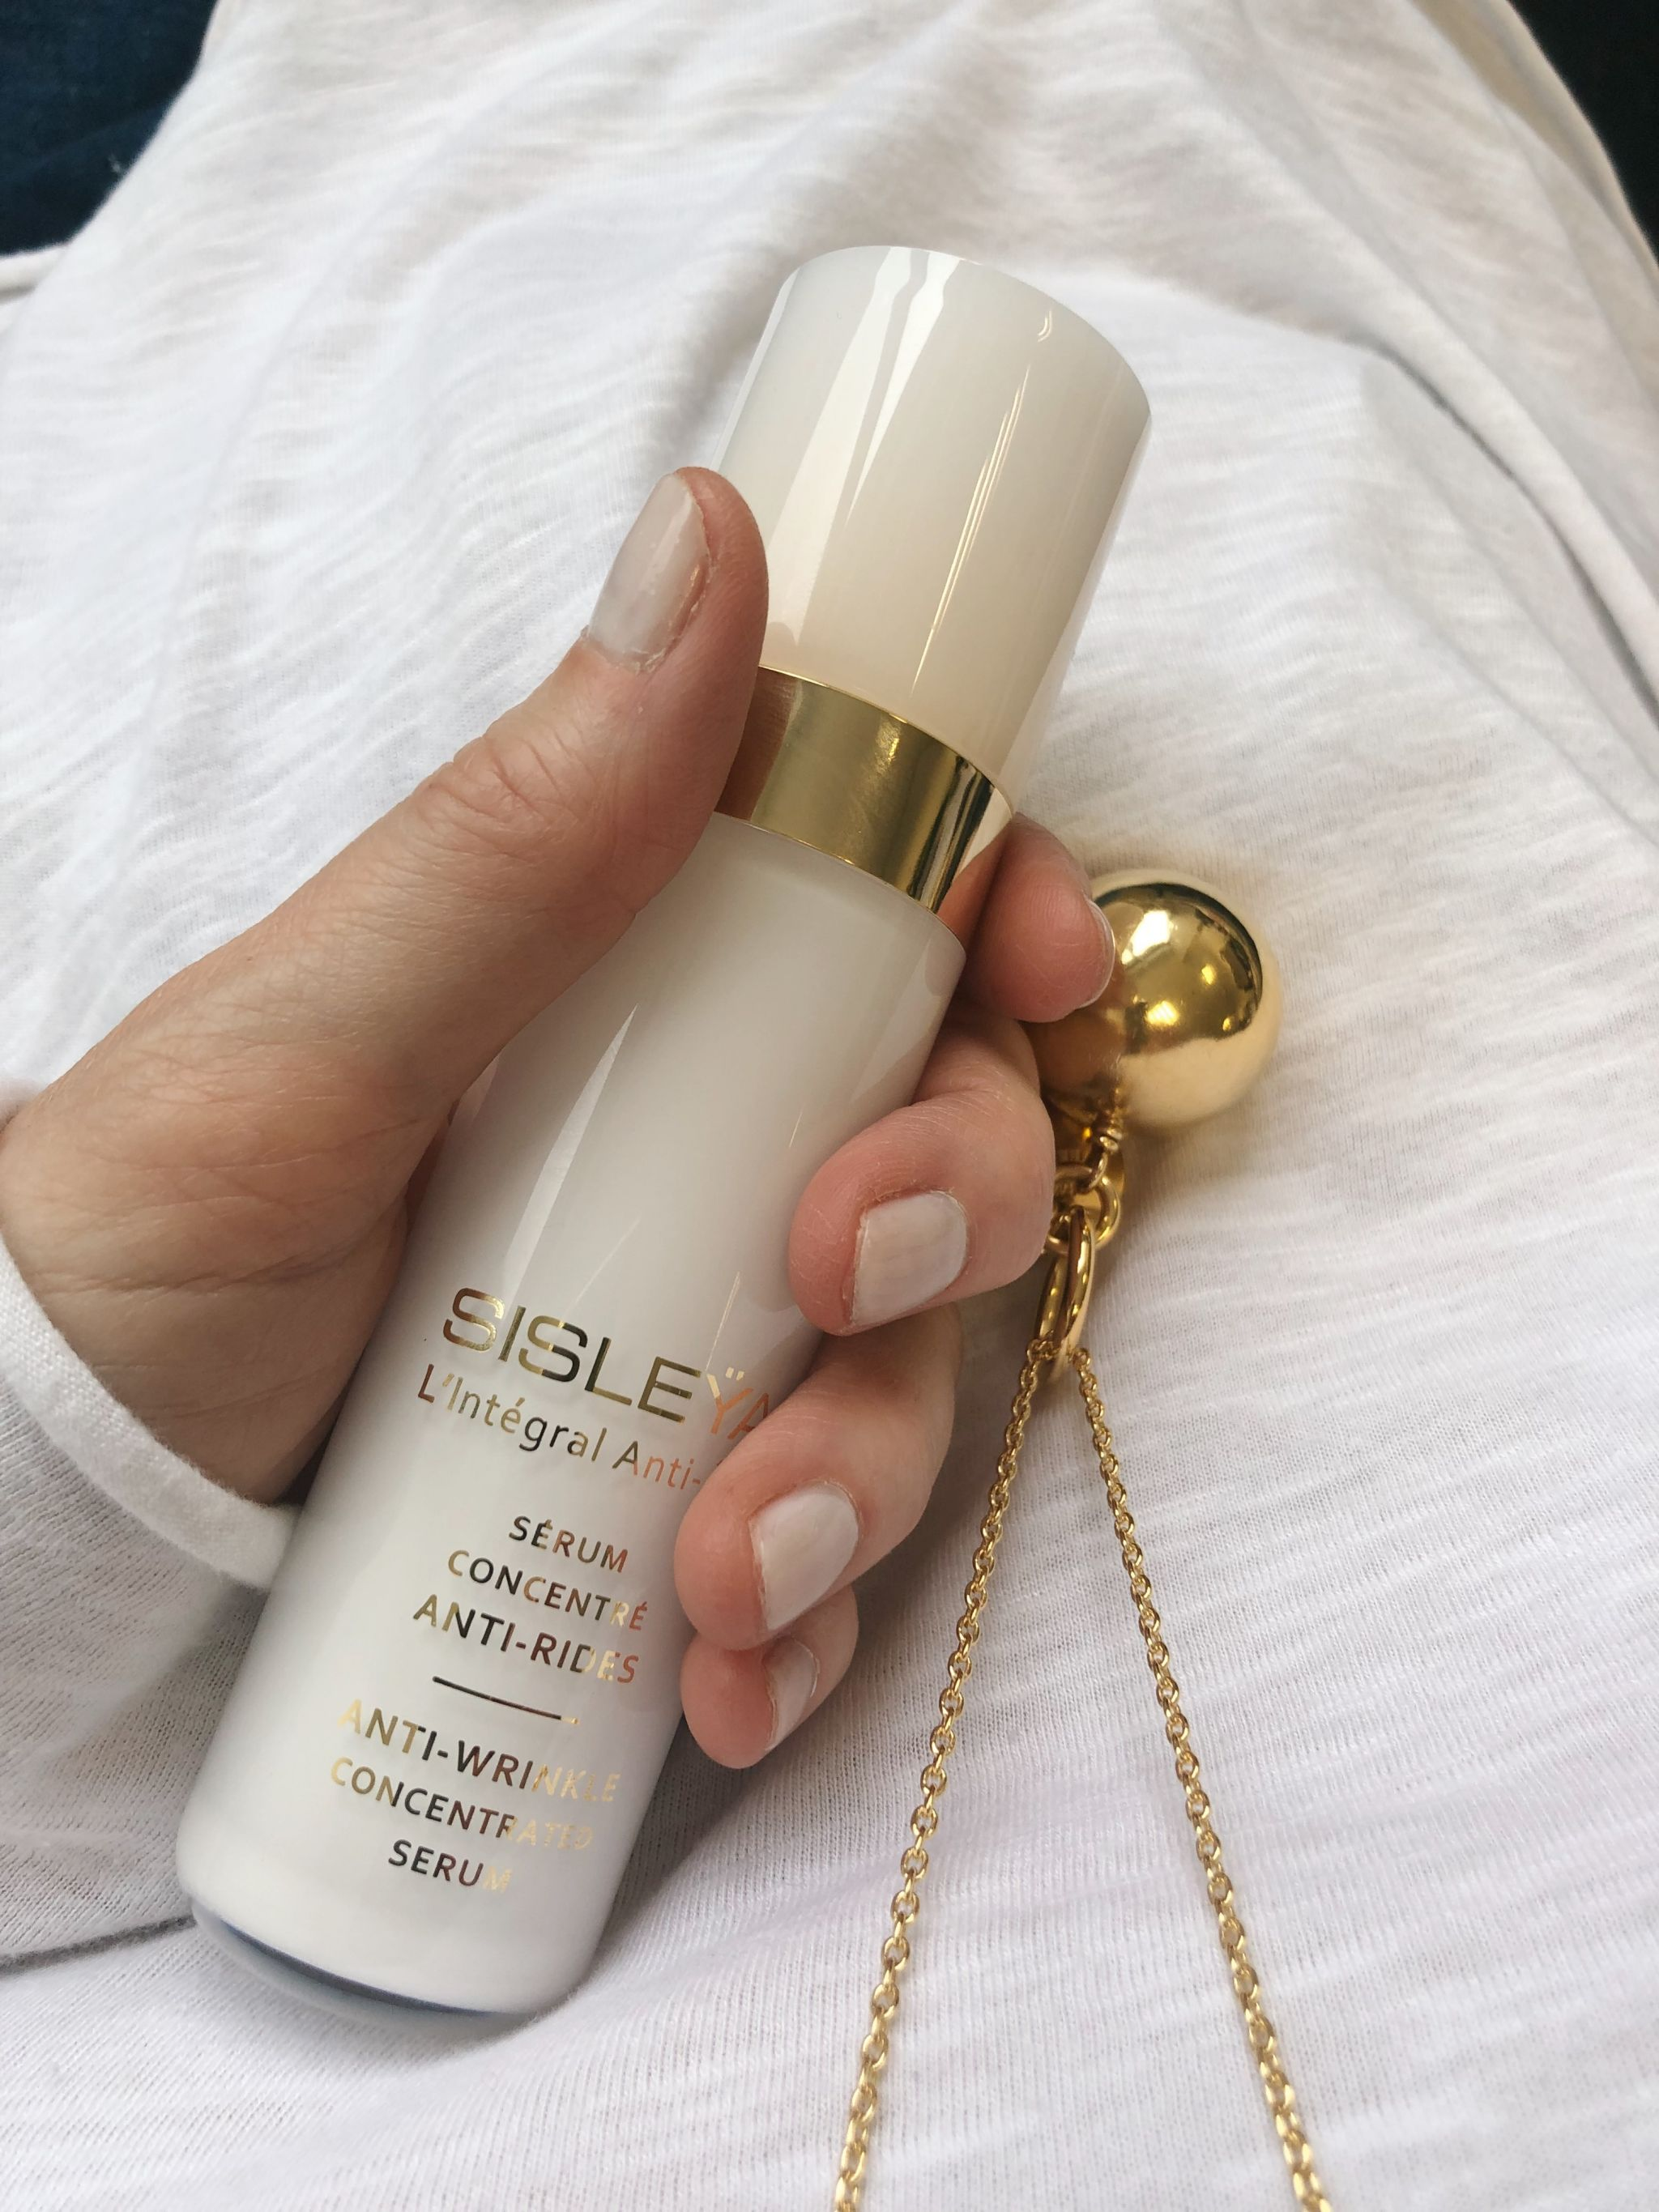 glamupyourlifestyle lidstrich ü-40-kosmetik bxnacht sisley-sisleya ü-50-kosmetik concealer loreal ü-40-blog ue-50-blog